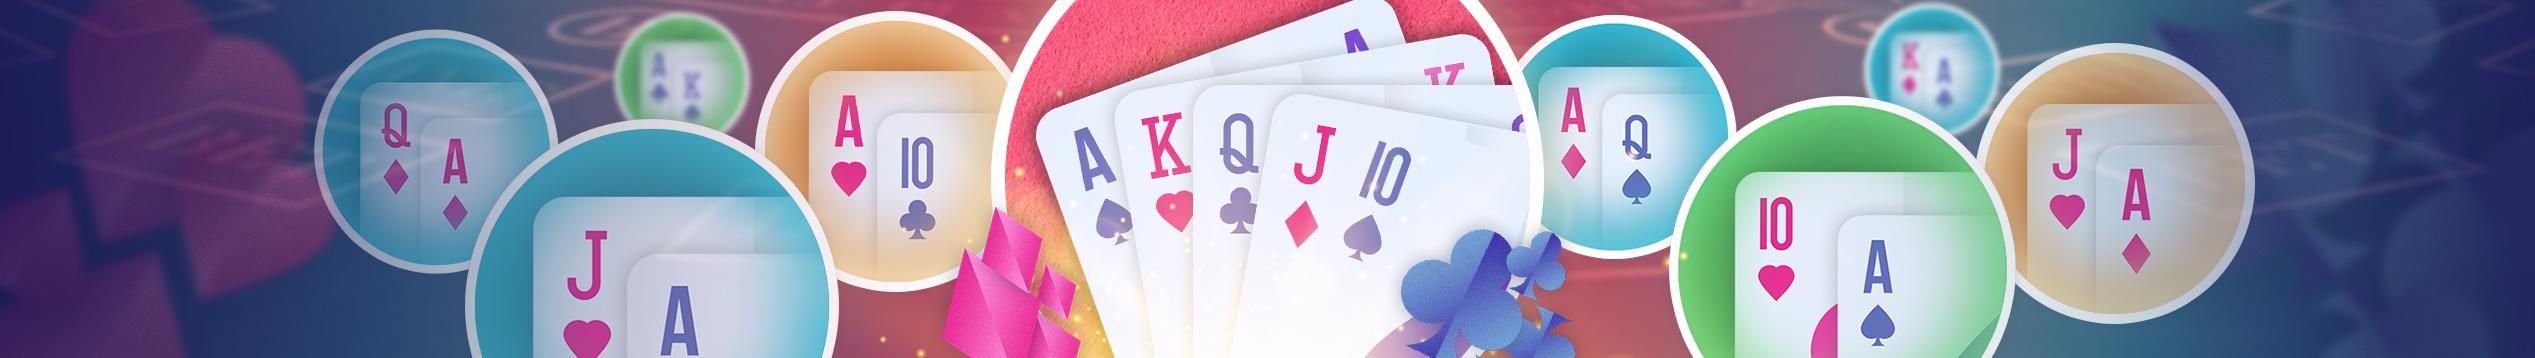 Blackjack-Special!